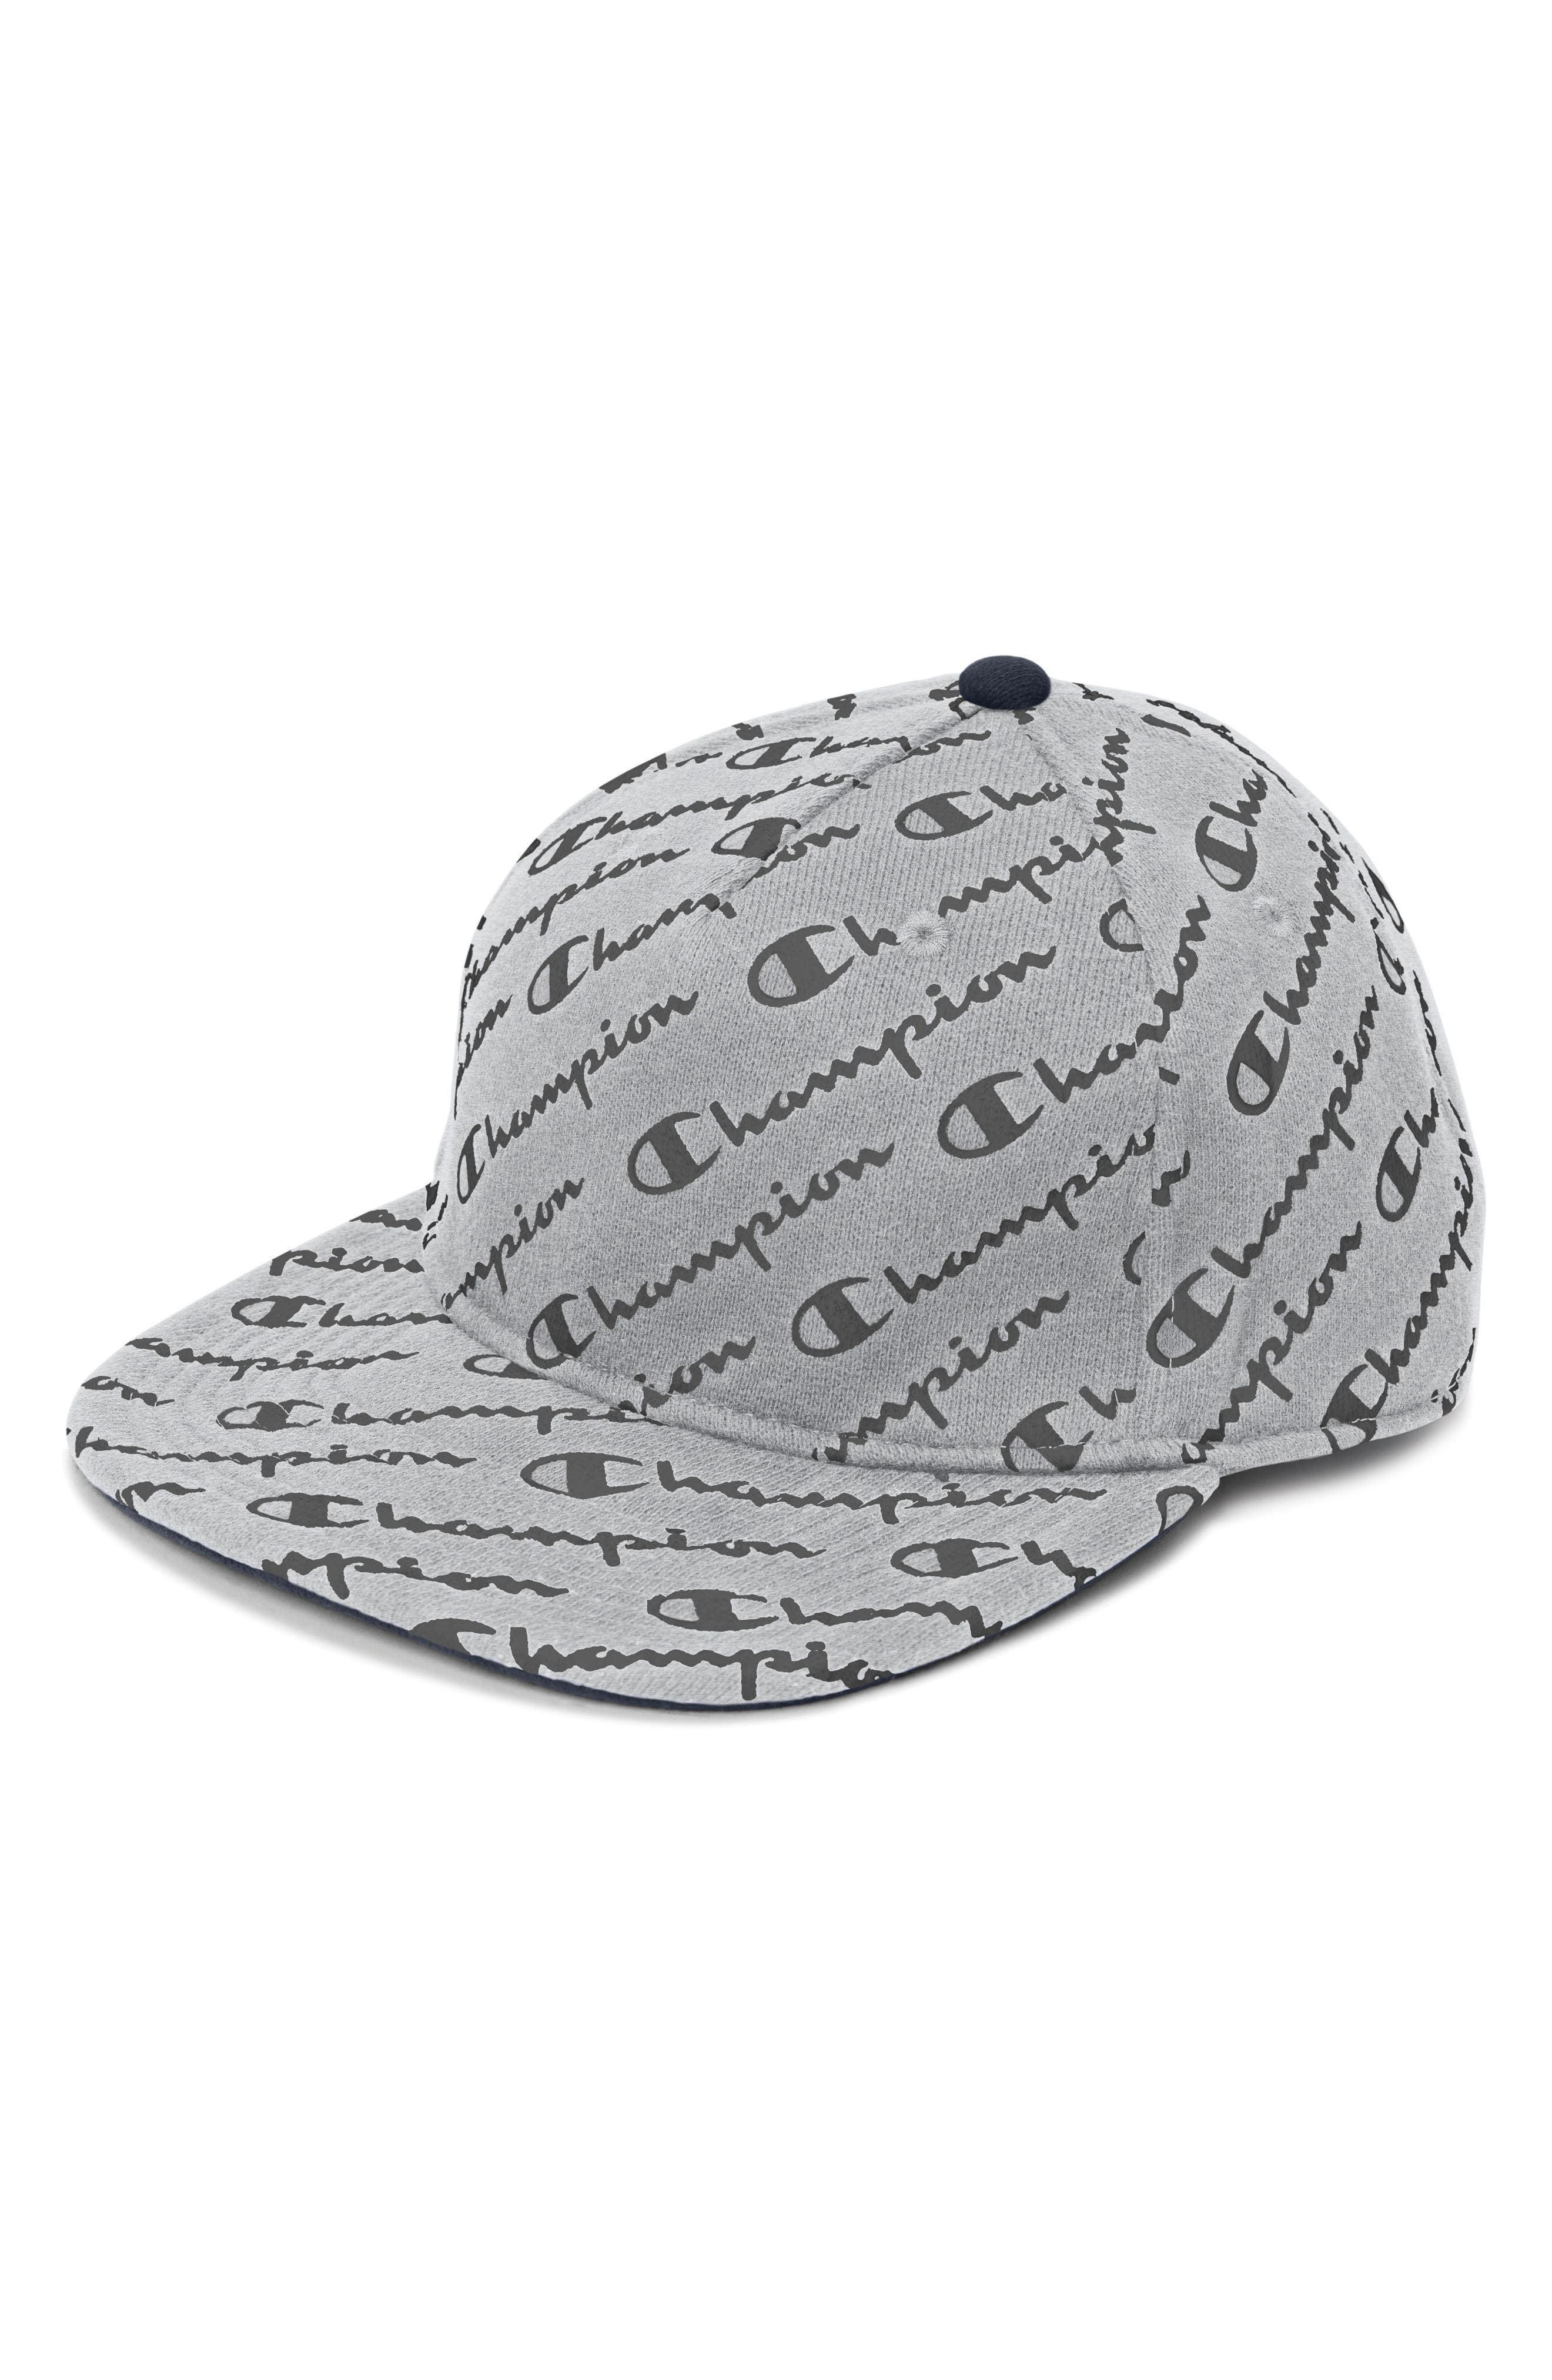 23463ce5ae0be wholesale champion reverse weave logo print ball cap nordstrom a32fe ed7e4